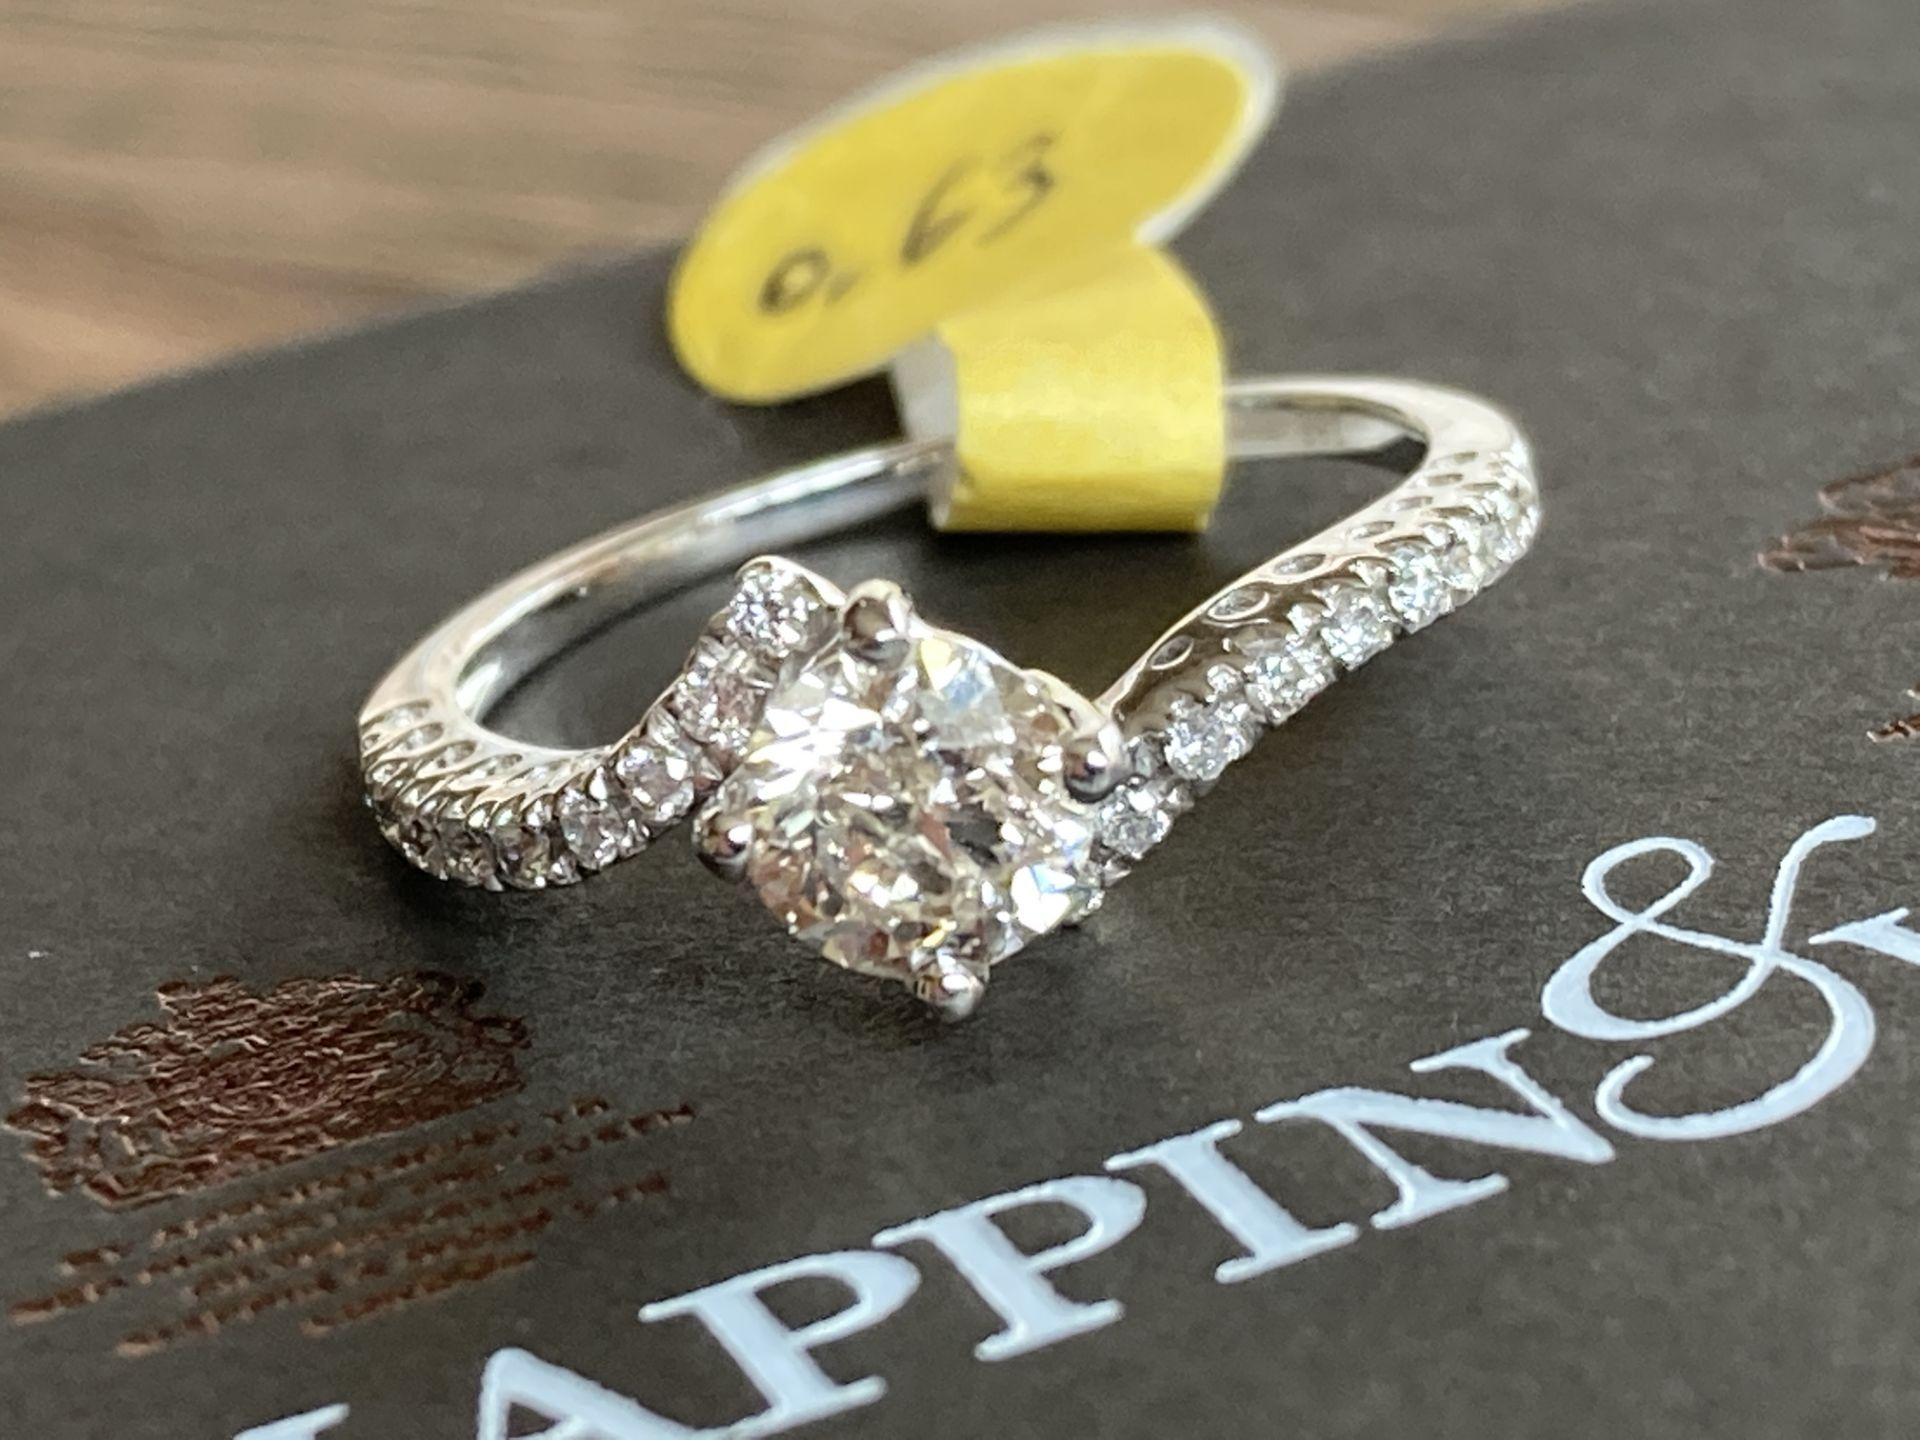 18CT GOLD 0.63CT DIAMOND RING